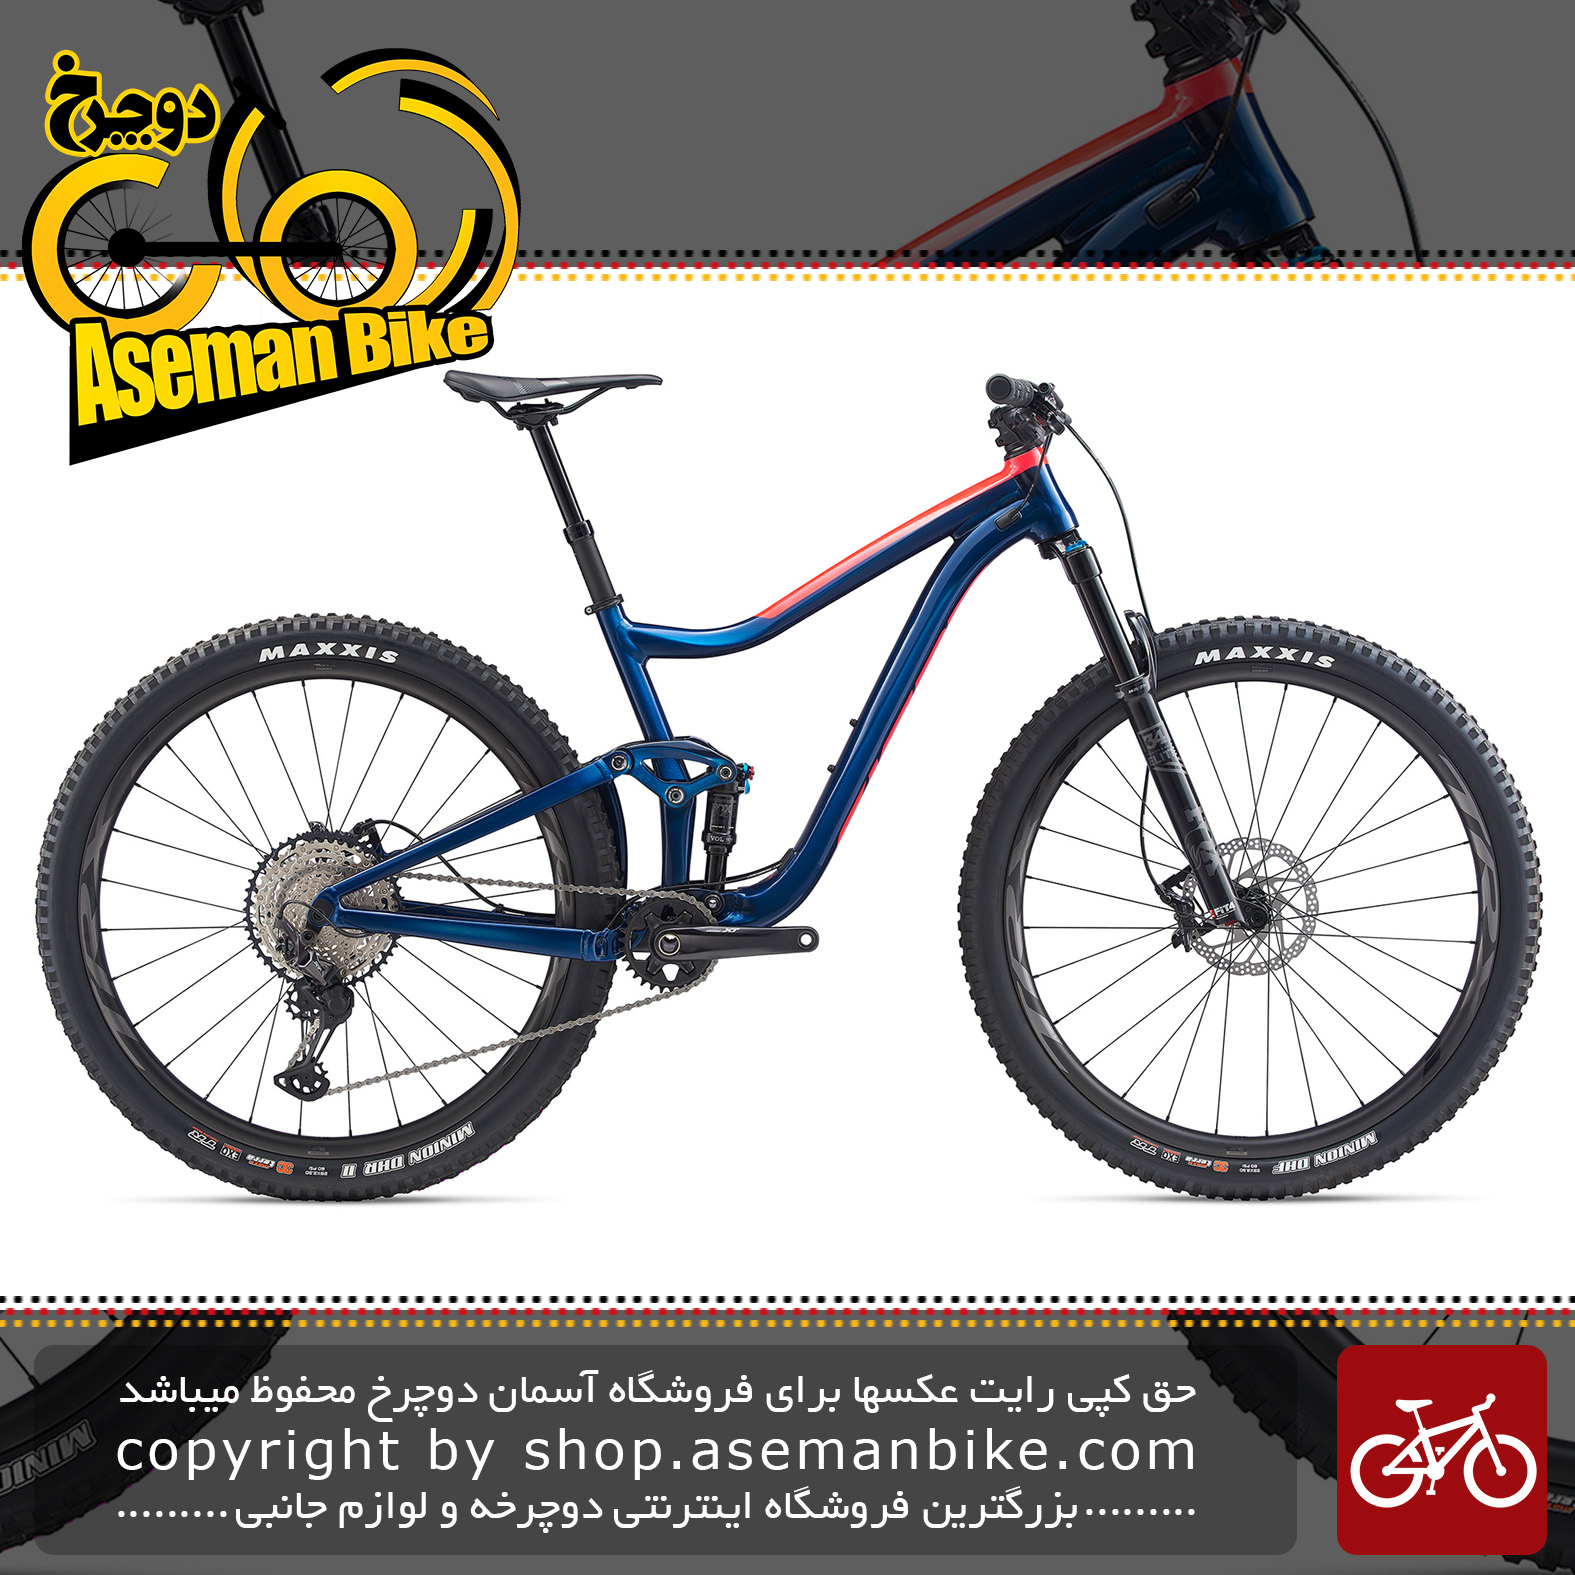 دوچرخه کوهستان جاینت مدل ترنس 29 1 2020 Giant Mountain Bicycle Trance 29 1 2020